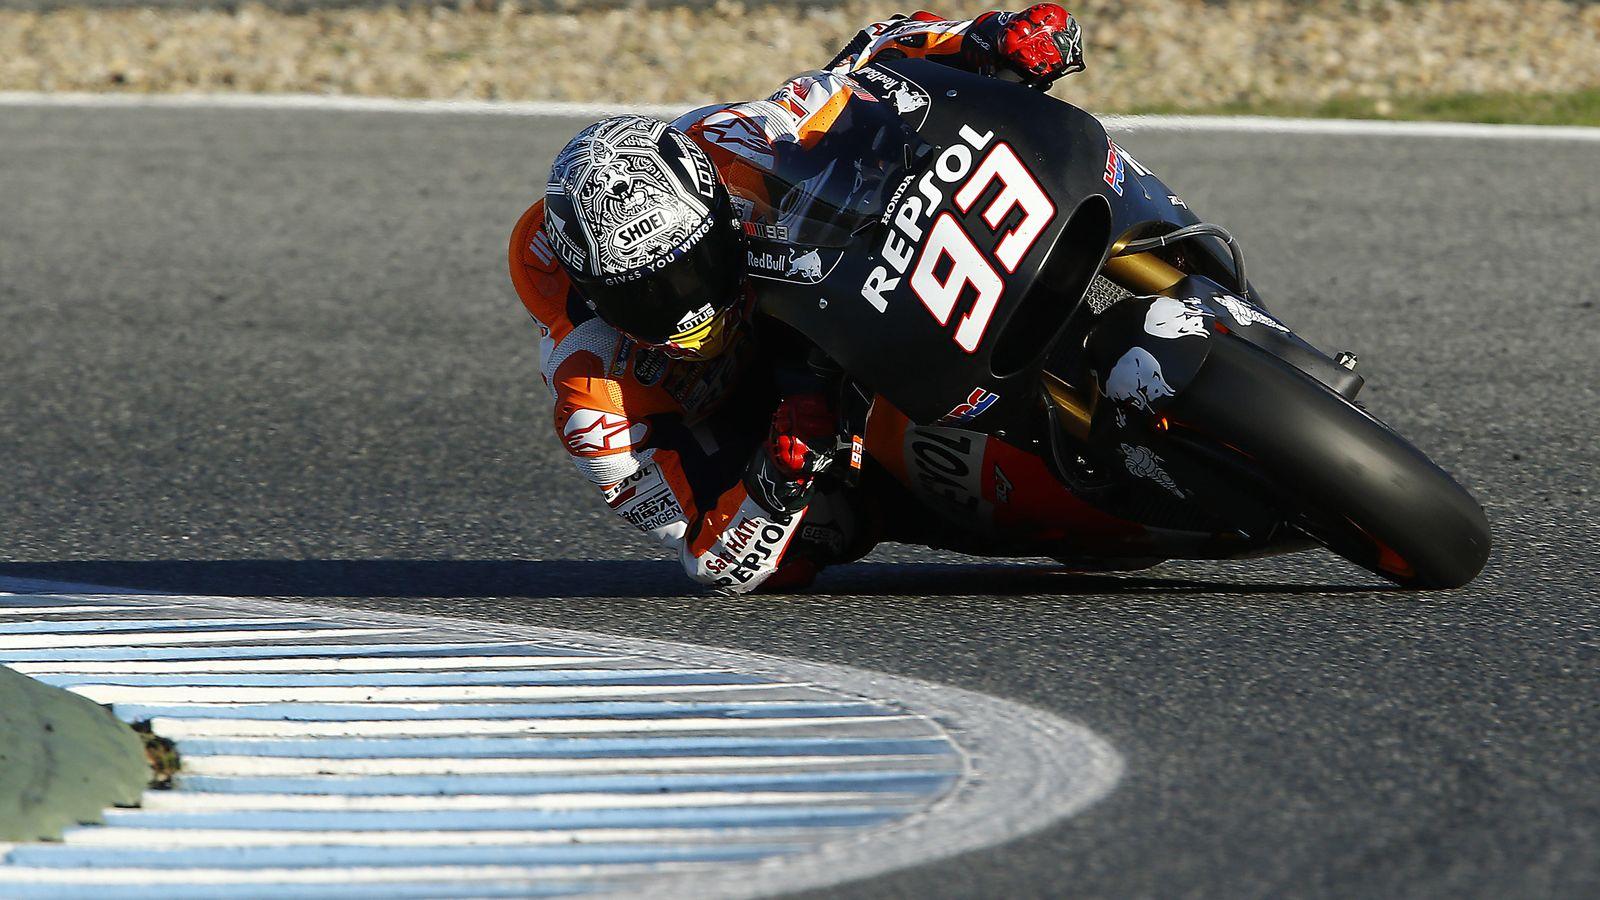 Foto: Marc Márquez en los test de Jerez (Repsol Media).